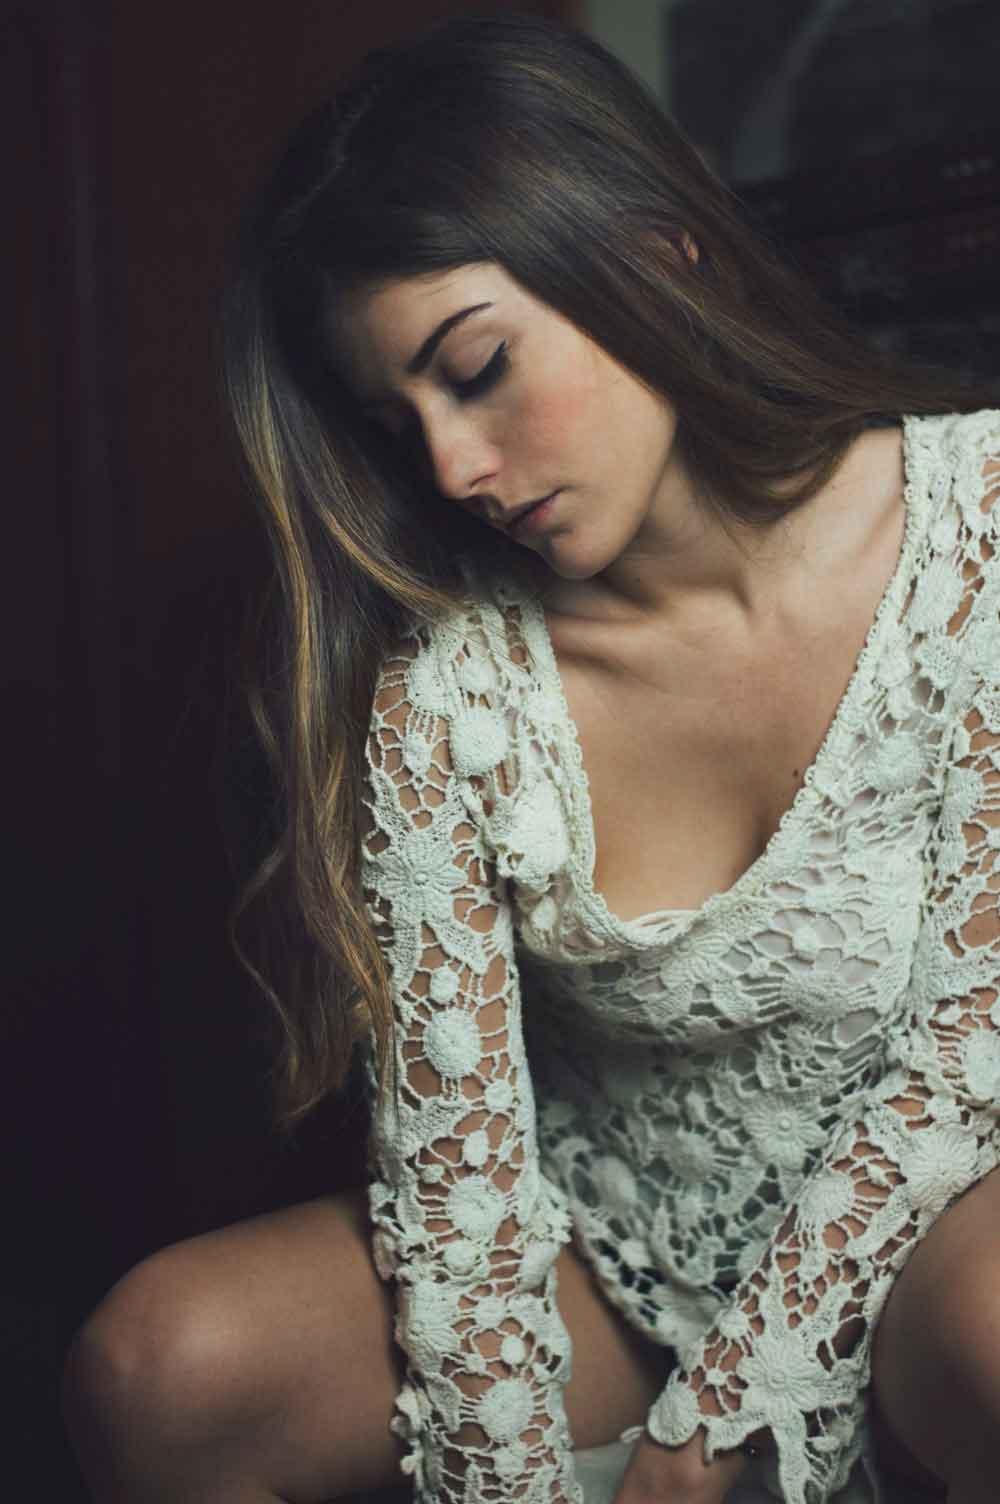 modele vivant femme sarah